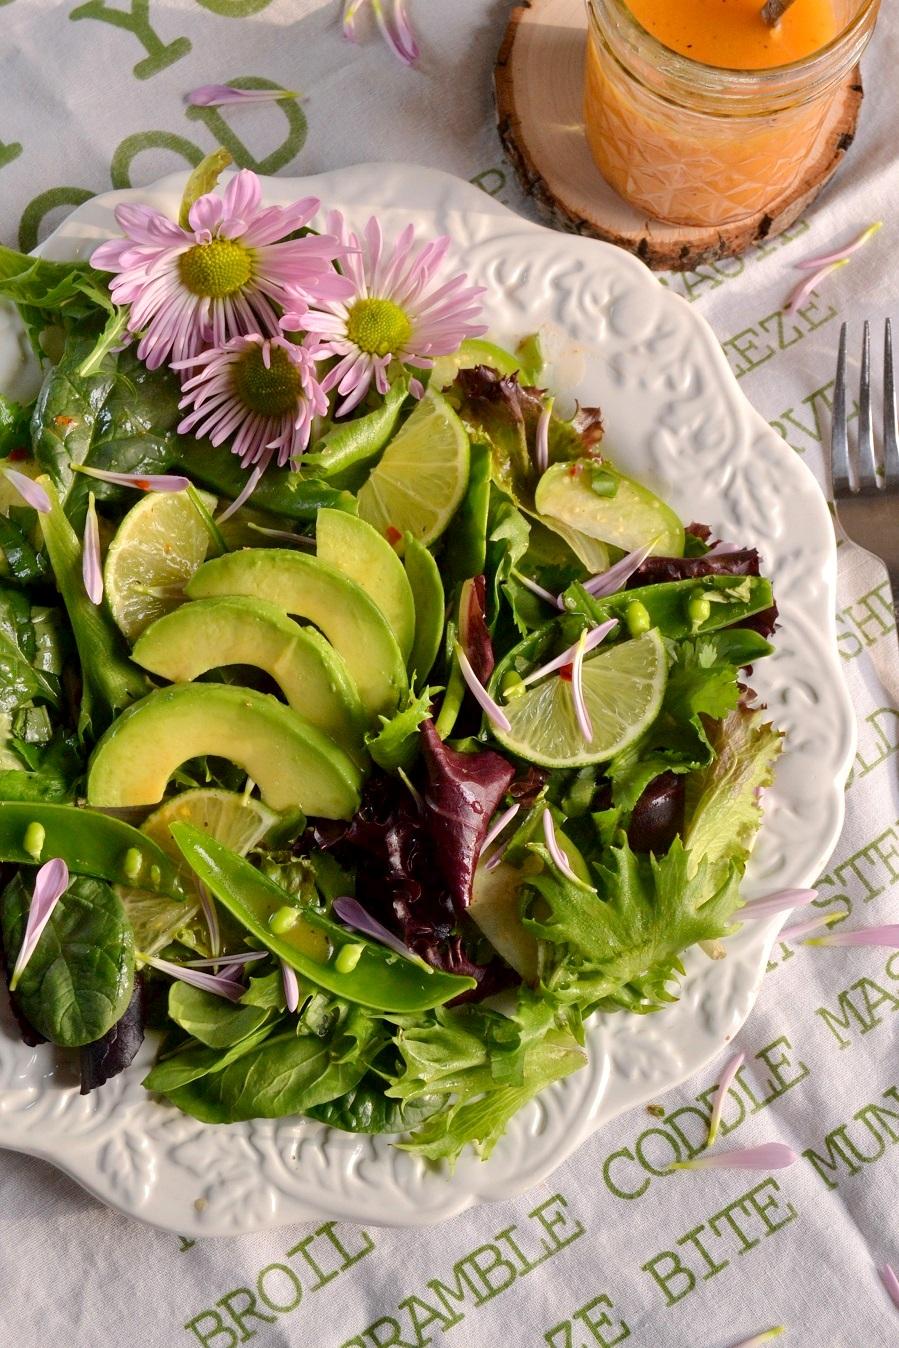 Spring Salad with Chile Lime Vinaigrette